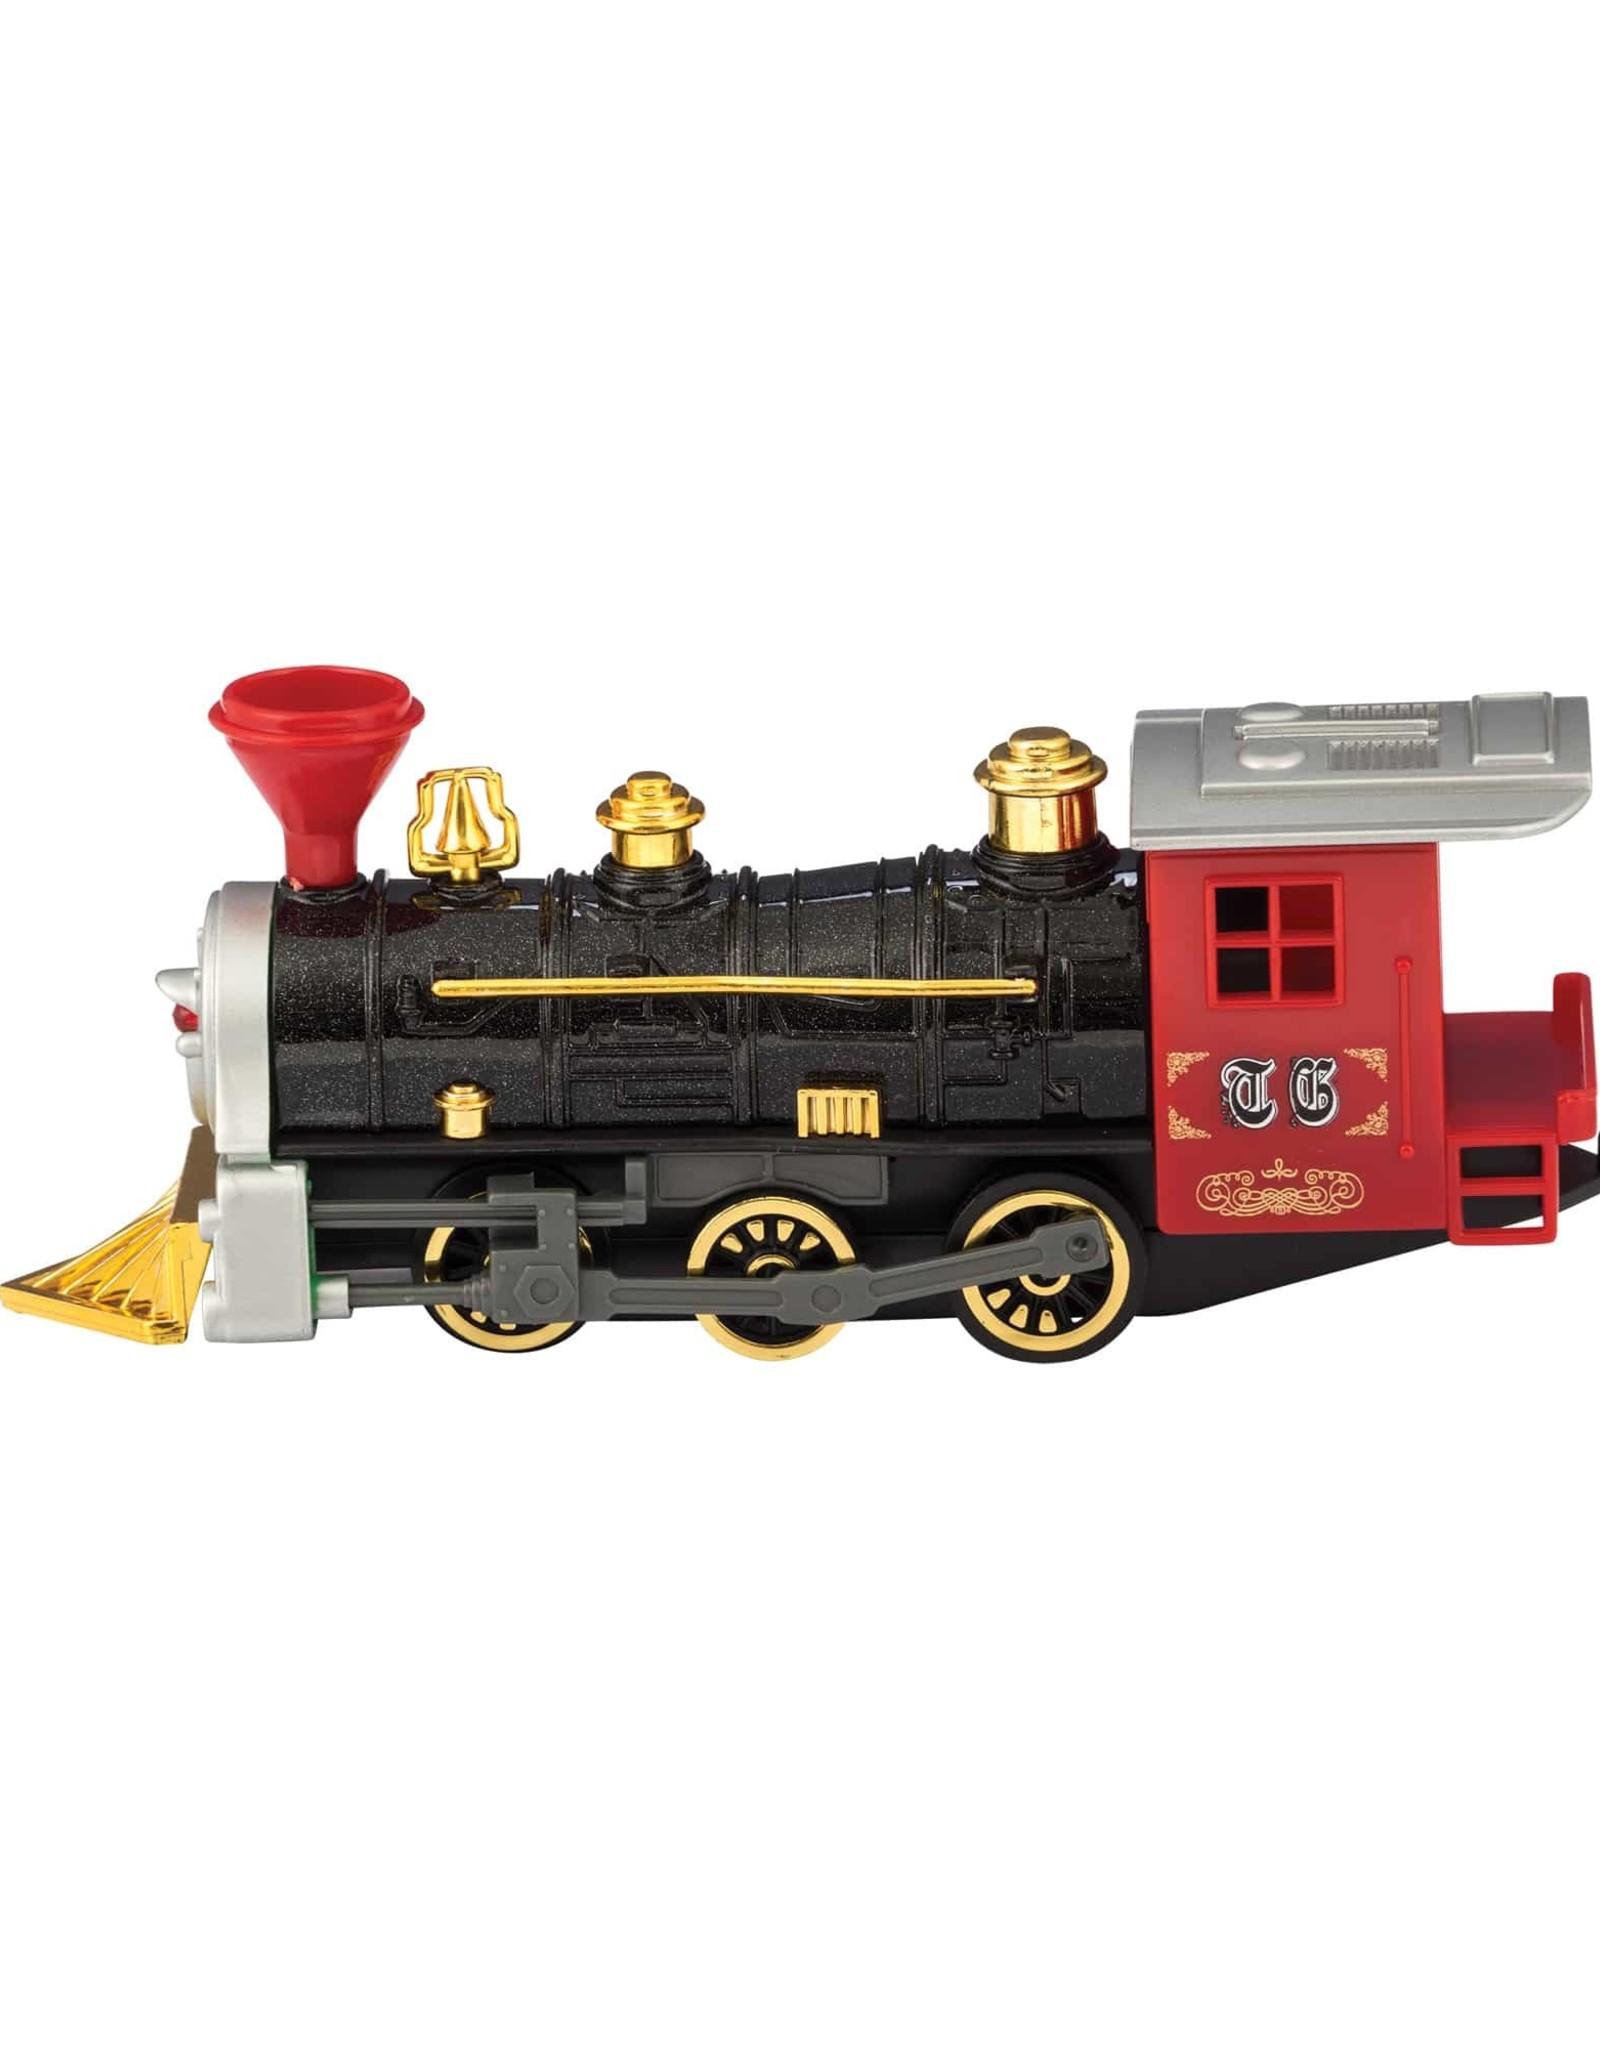 Schylling Die Cast Large Locomotives